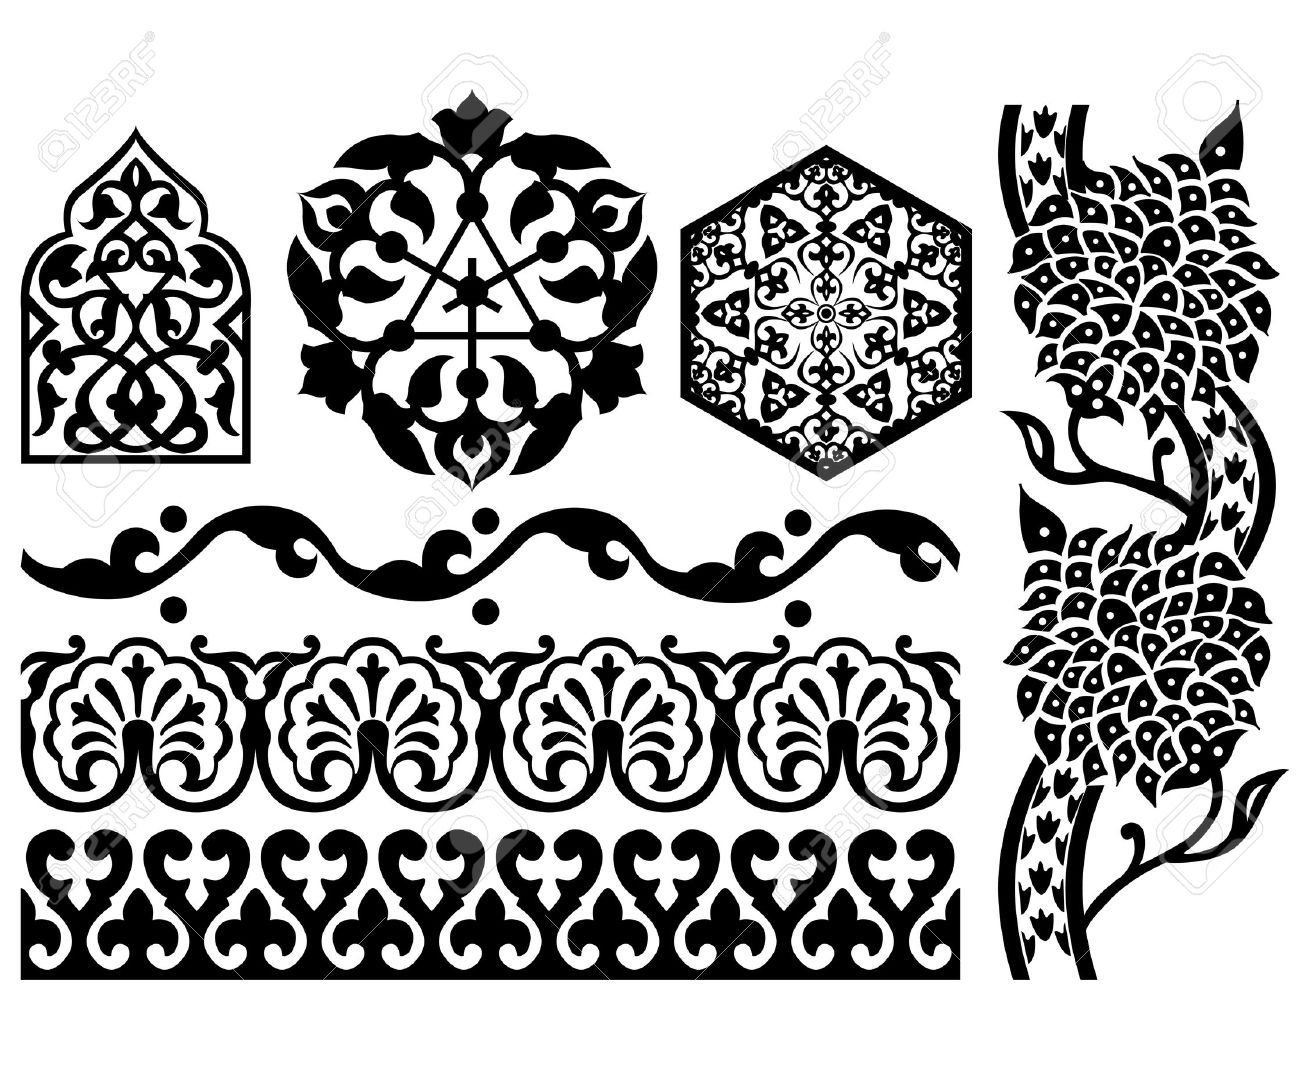 Free Islamic Design Cliparts, Download Free Clip Art, Free.